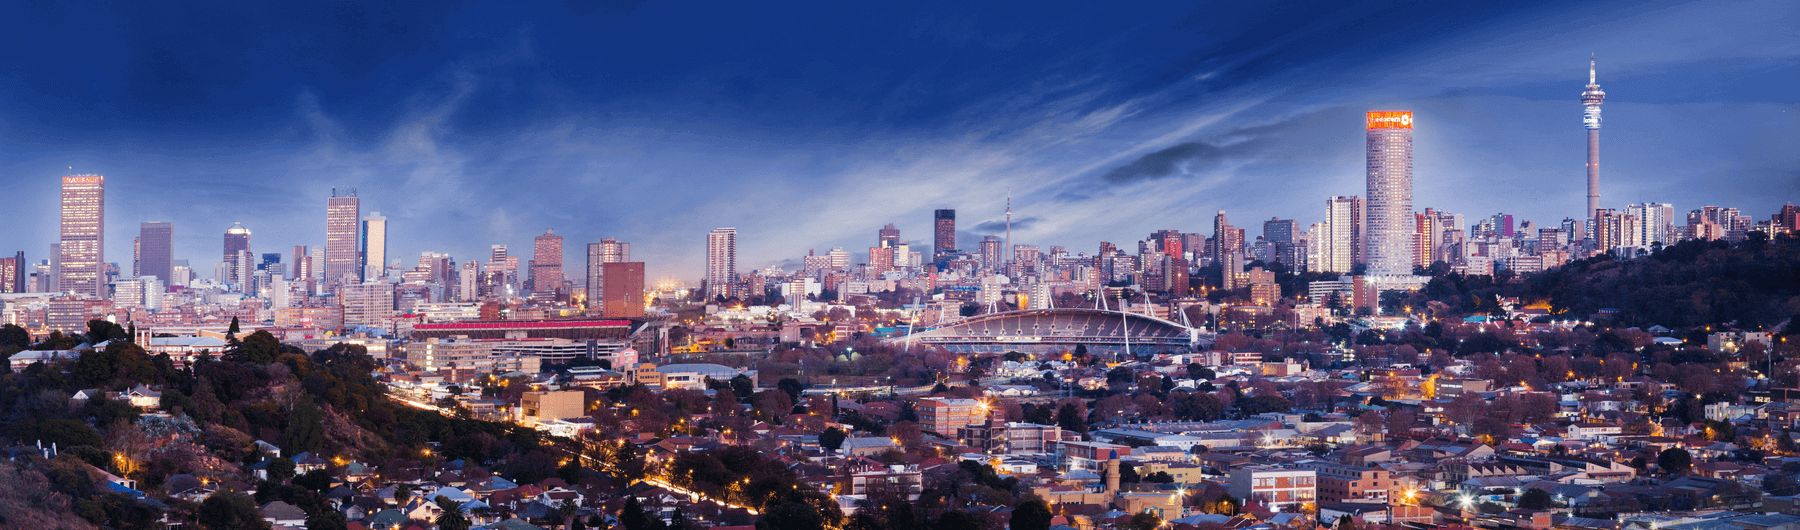 Johannesburg City Scape